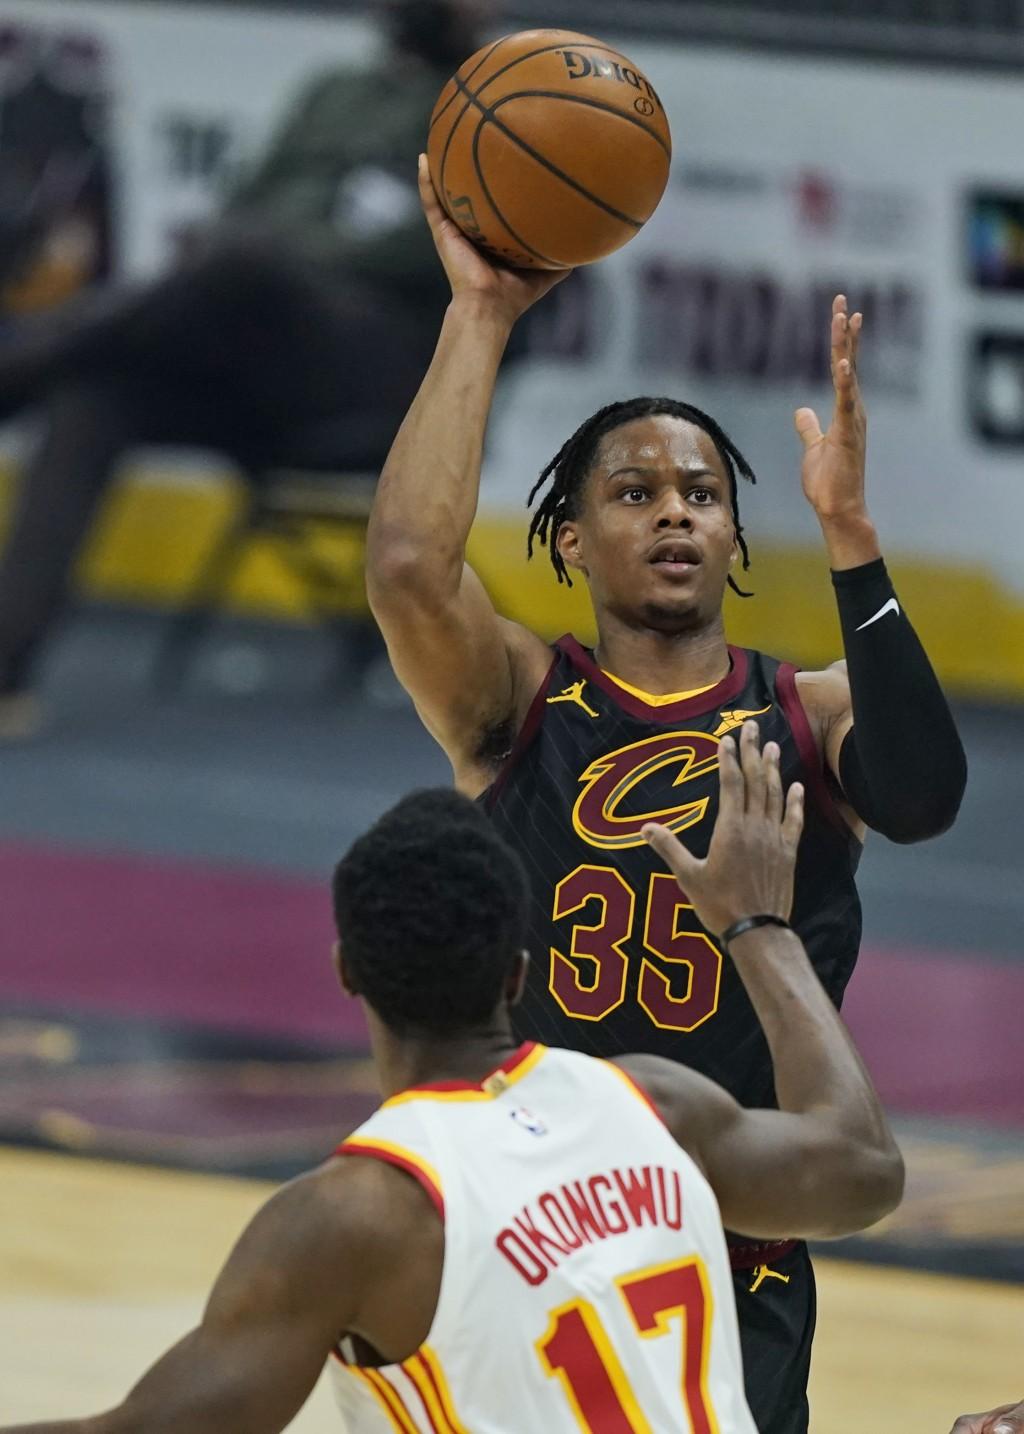 Cleveland Cavaliers' Isaac Okoro (35) shoots over Atlanta Hawks' Onyeka Okongwu (17) in the first half of an NBA basketball game, Tuesday, Feb. 23, 20...